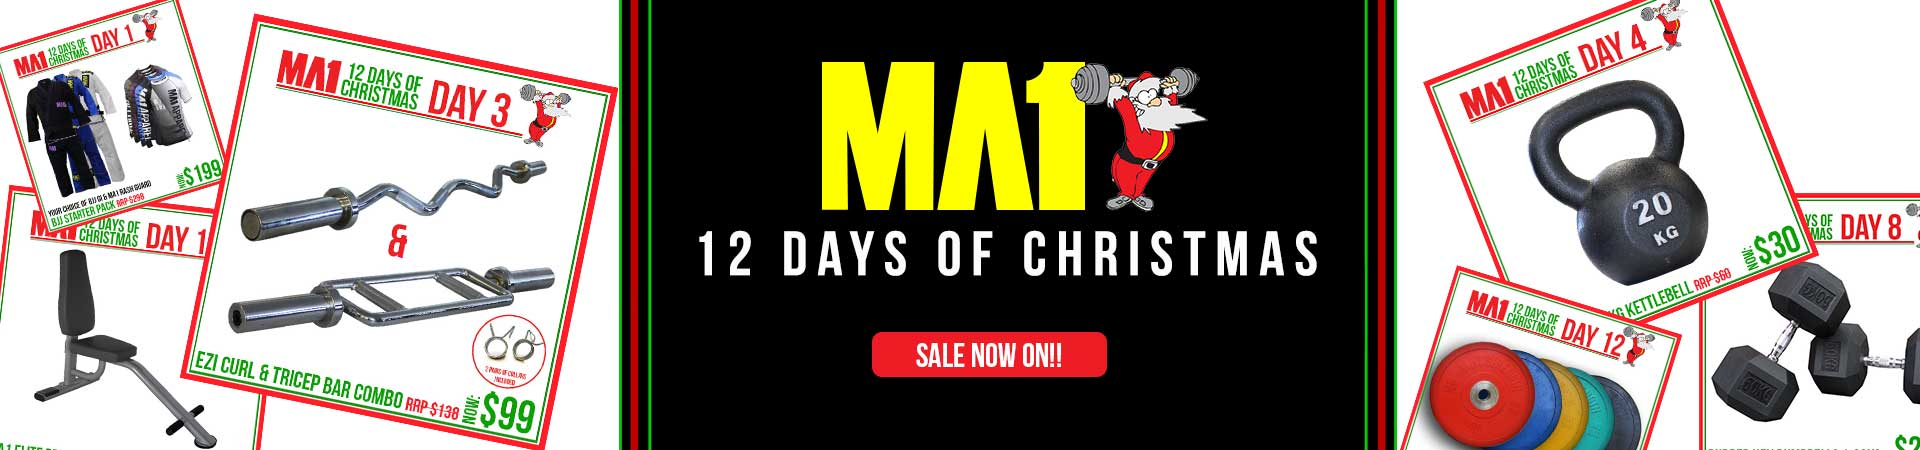 MA1 XMAS Sale!